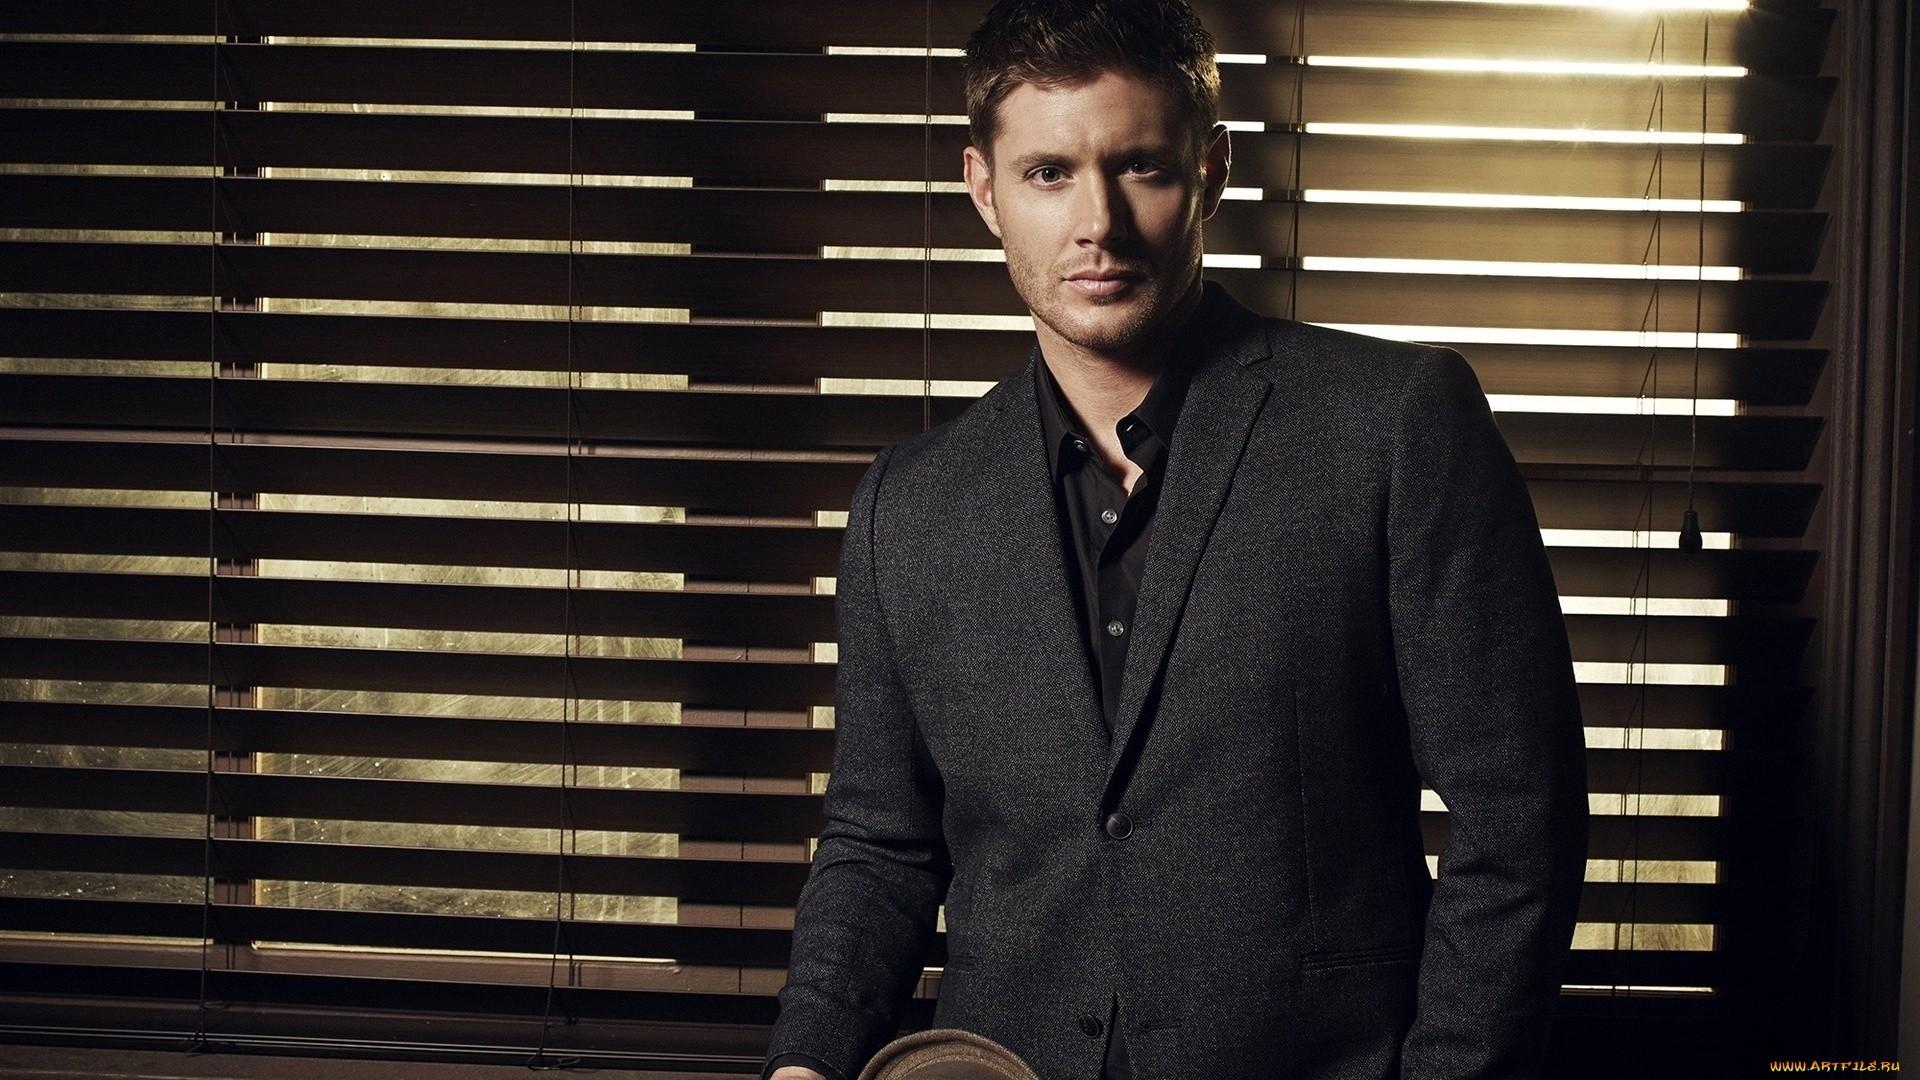 Jensen Ackles Wallpaper Free Download